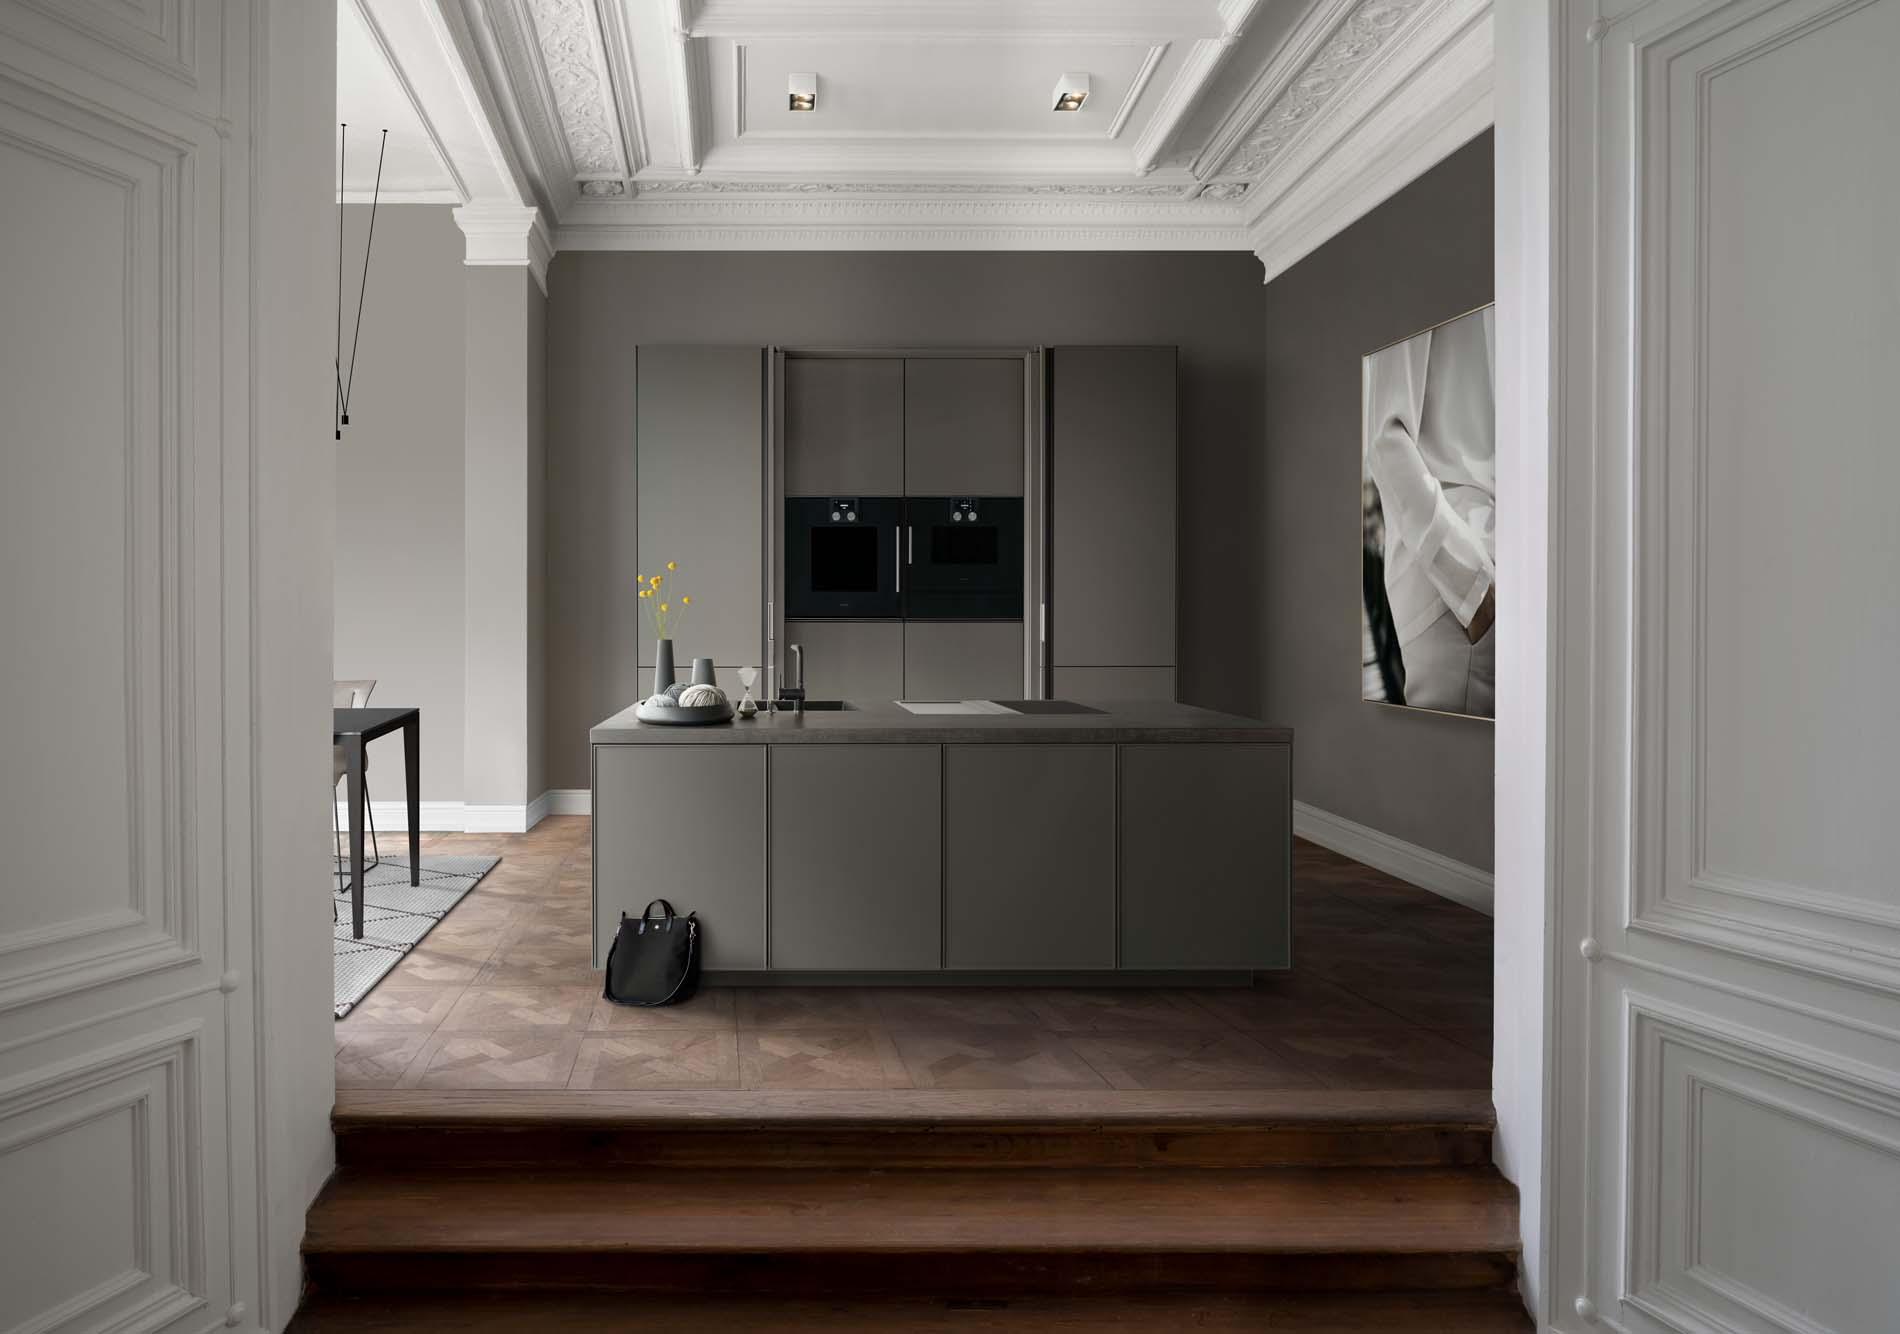 SieMatic Pure - SieMatic keuken grijs kookeiland met hoge keukenkasten, ASWA Keukens